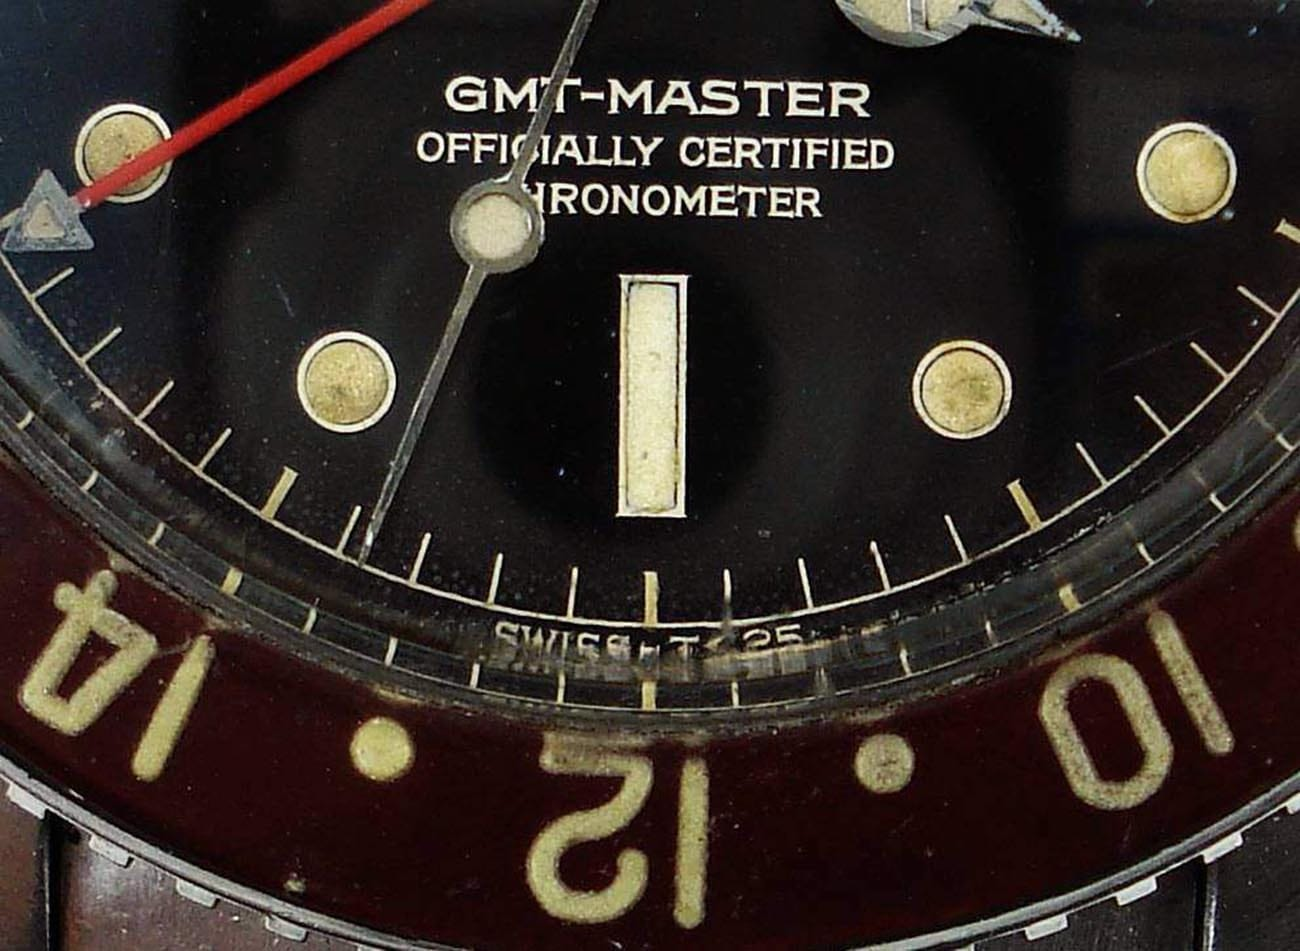 A History of Rolex vintage GMT-master pepsi 6542 bakelite